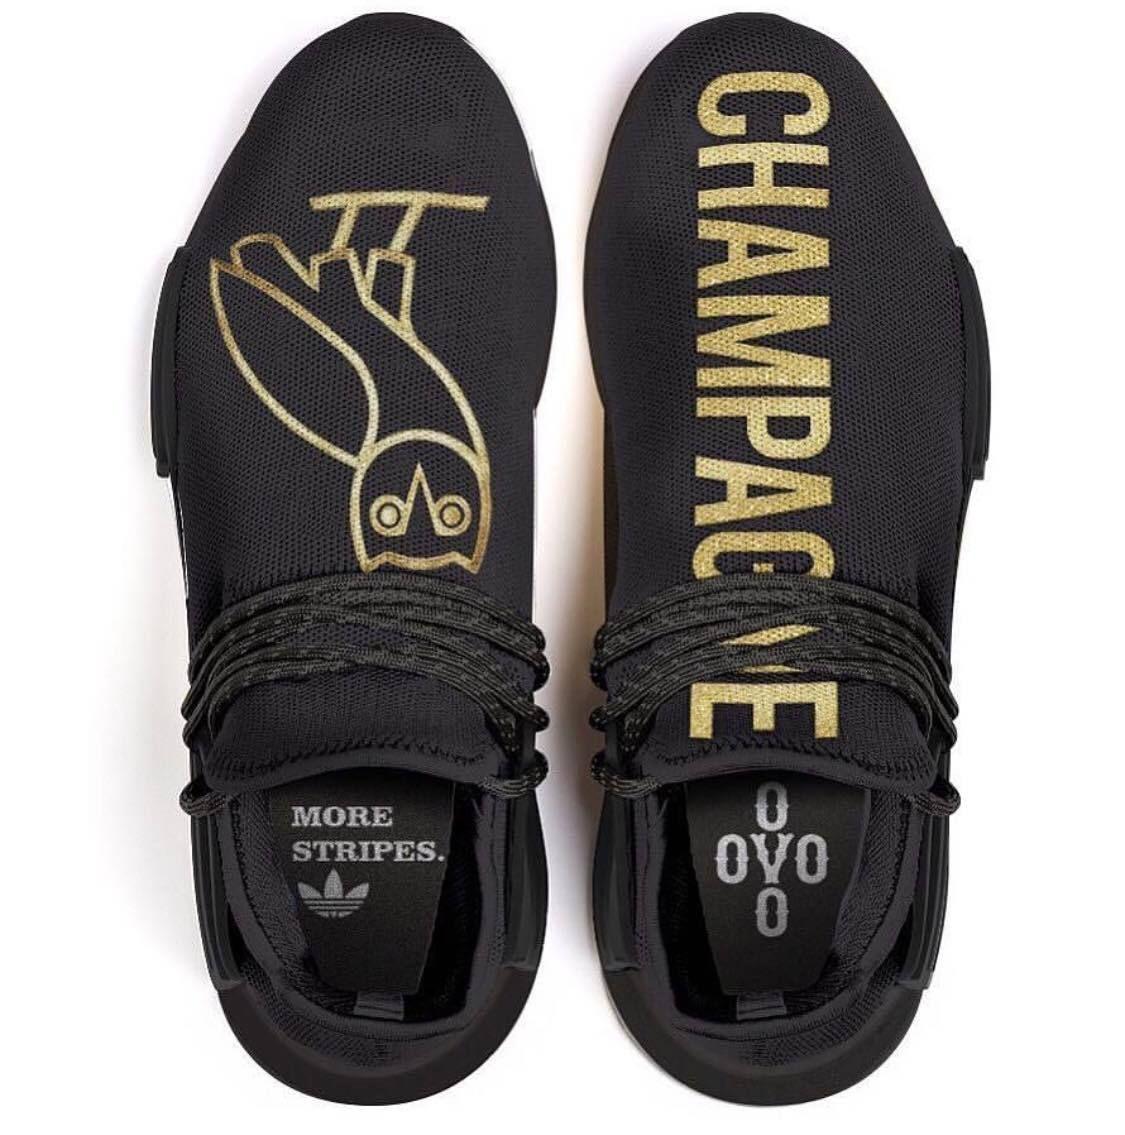 san francisco e74f7 e6914 아디다스(Adidas) X OVO HU NMD 협업하다? #스트릿패션 #스트릿 ...